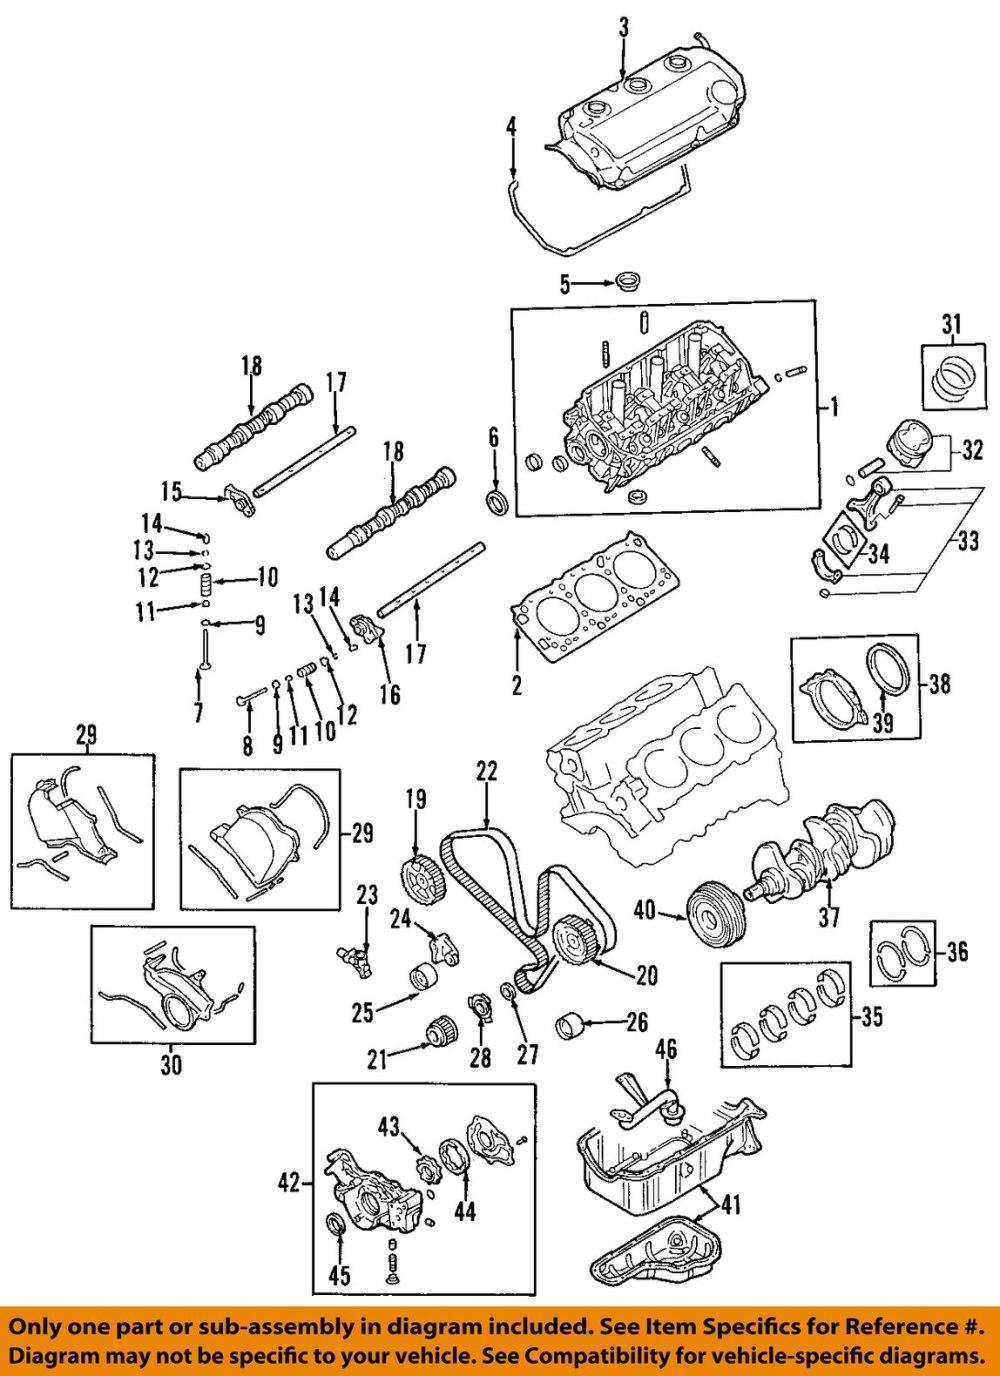 medium resolution of wiring drawling for 2003 3 0 mitsubishi engine online wiring diagram 2005 mitsubishi endeavor